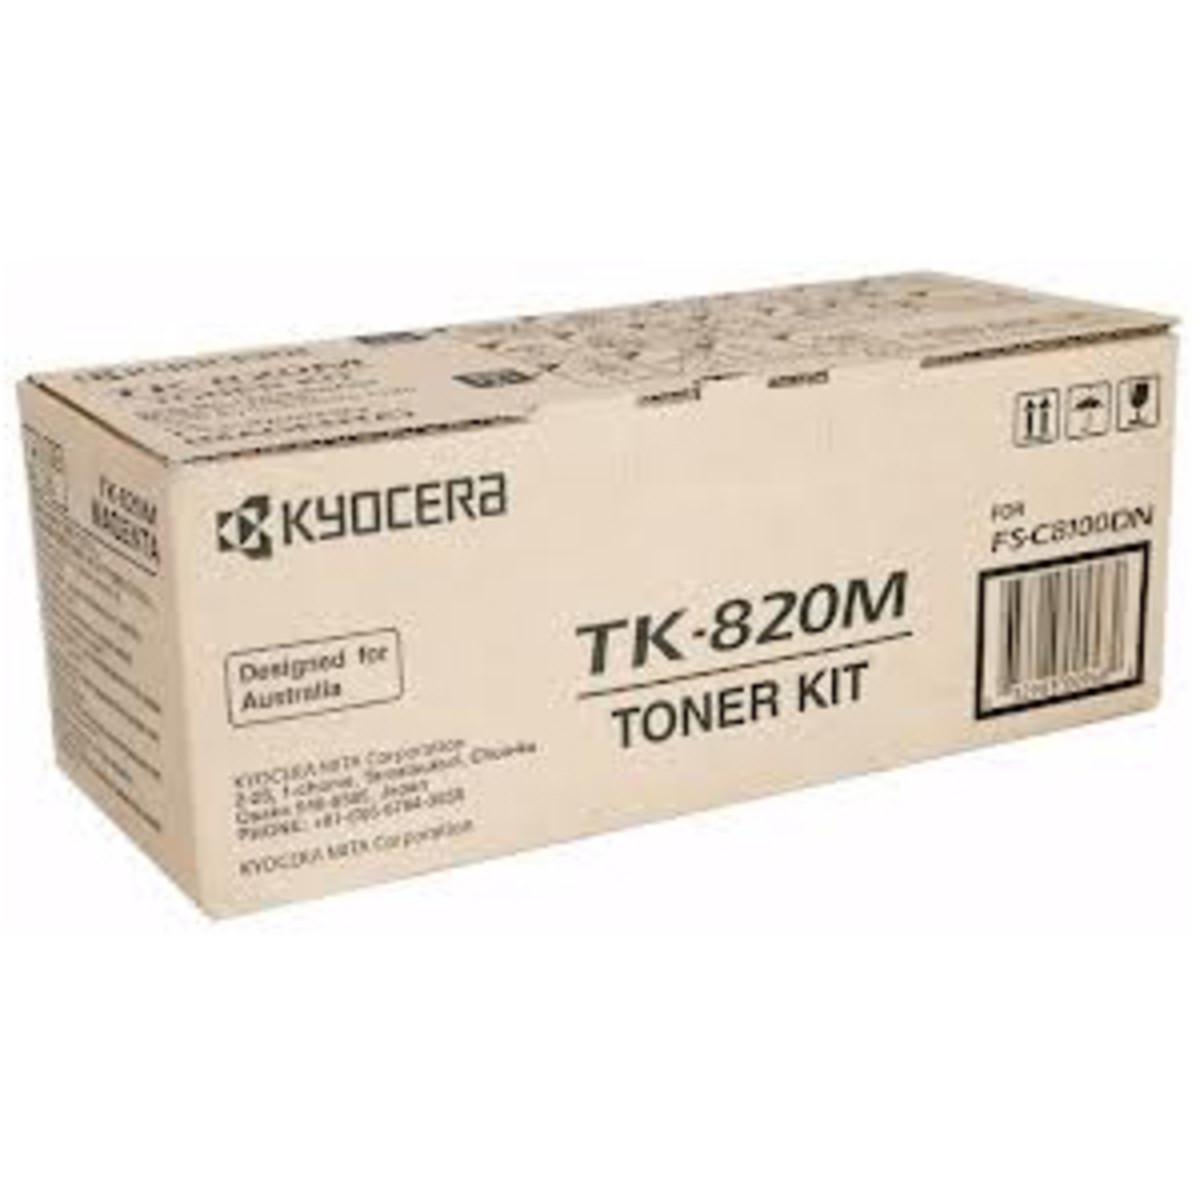 Kyocera TK-820M Magenta Toner Cartridge